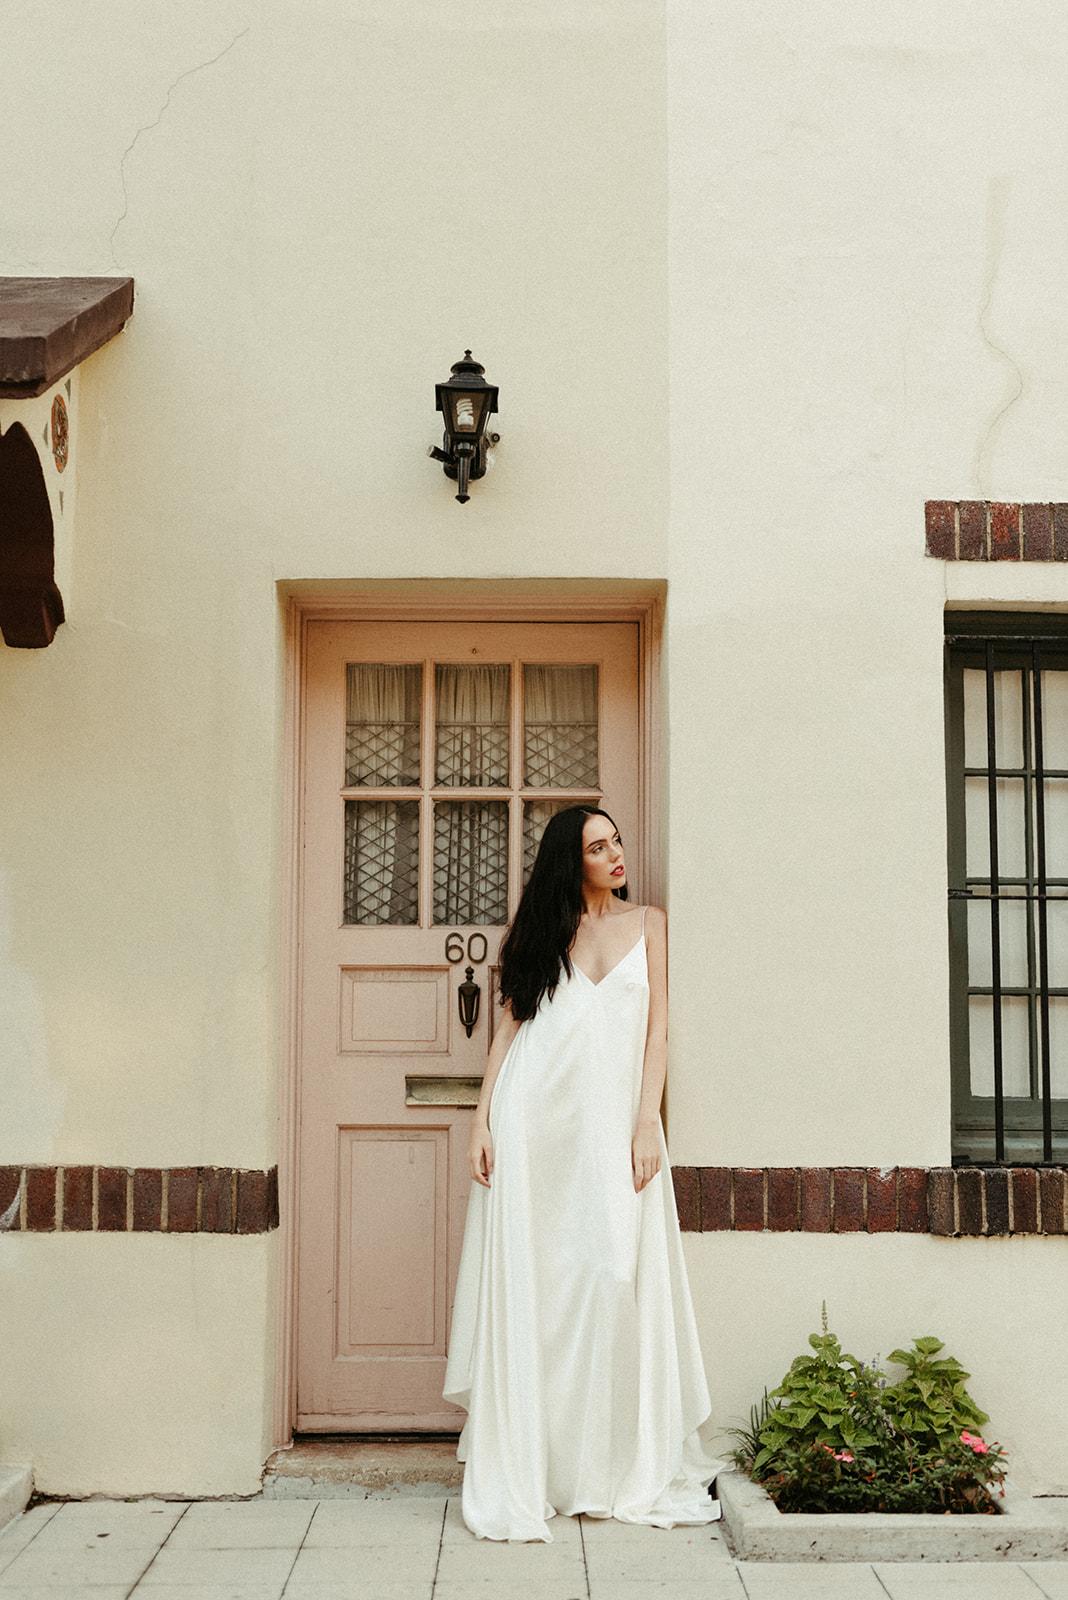 goli-june-bridal-050.jpg